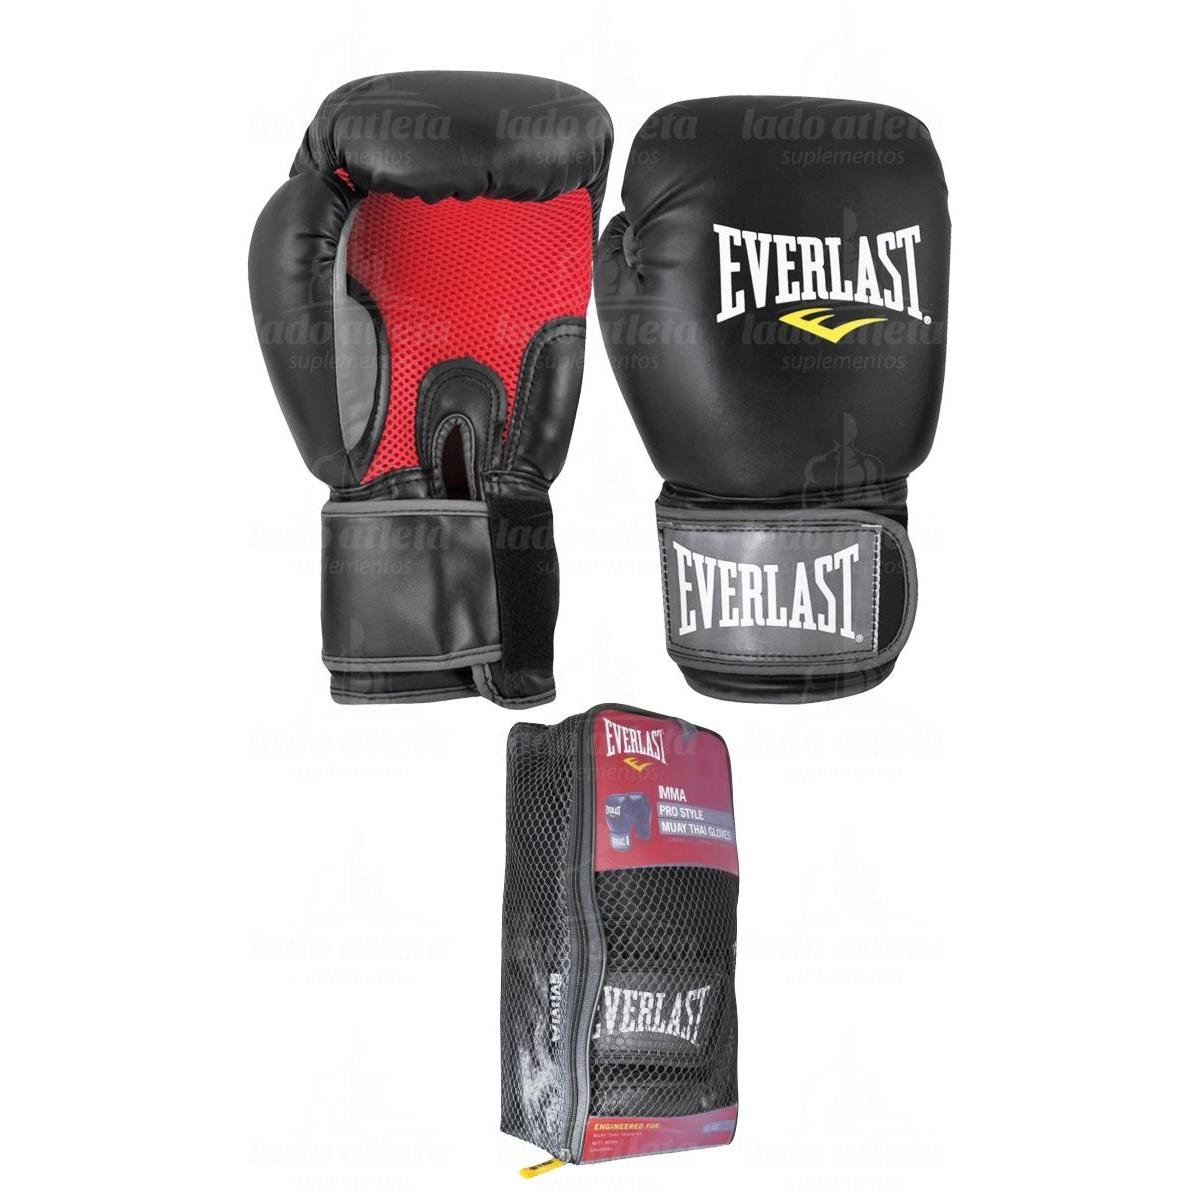 Luva Mma   Muay Thai Pro Style Everlast - Compre Agora  bcd64d265719a